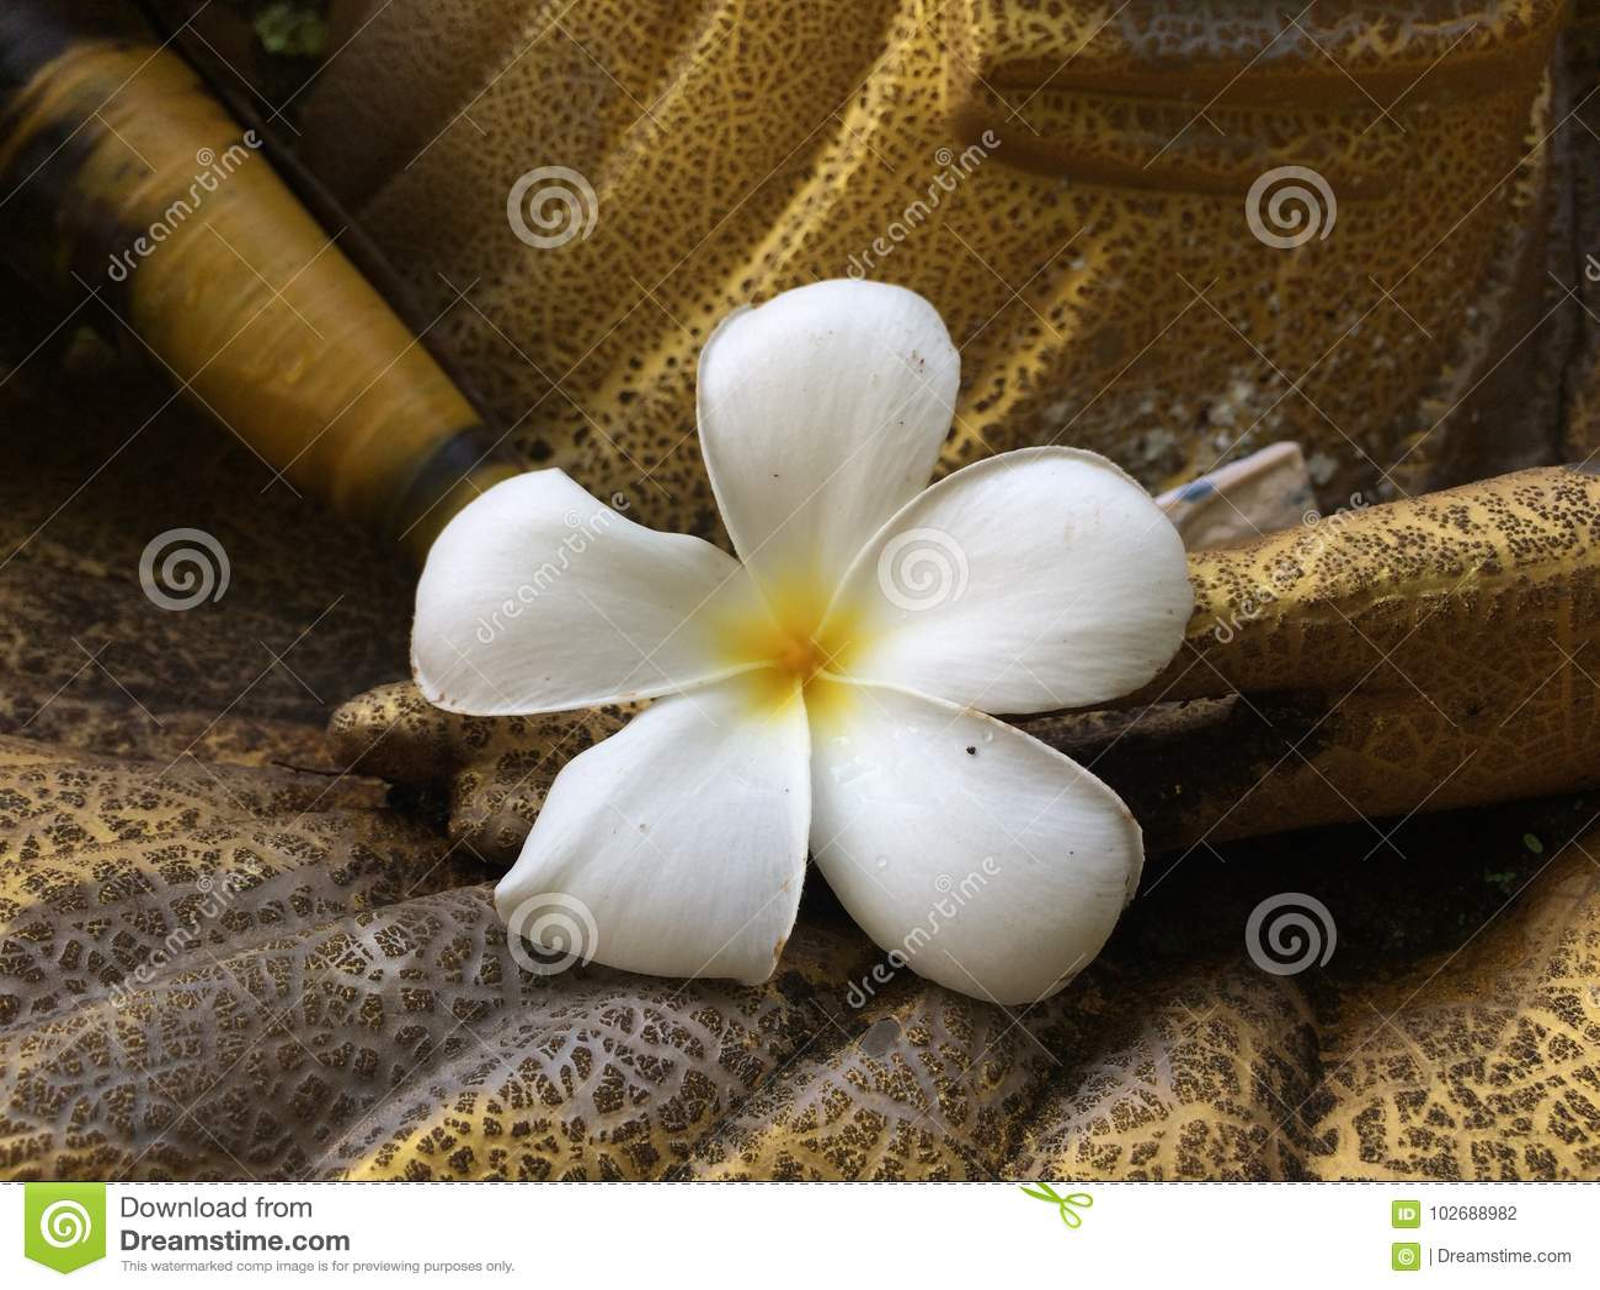 Hite Plumeria put on hand of golden statue,white flower